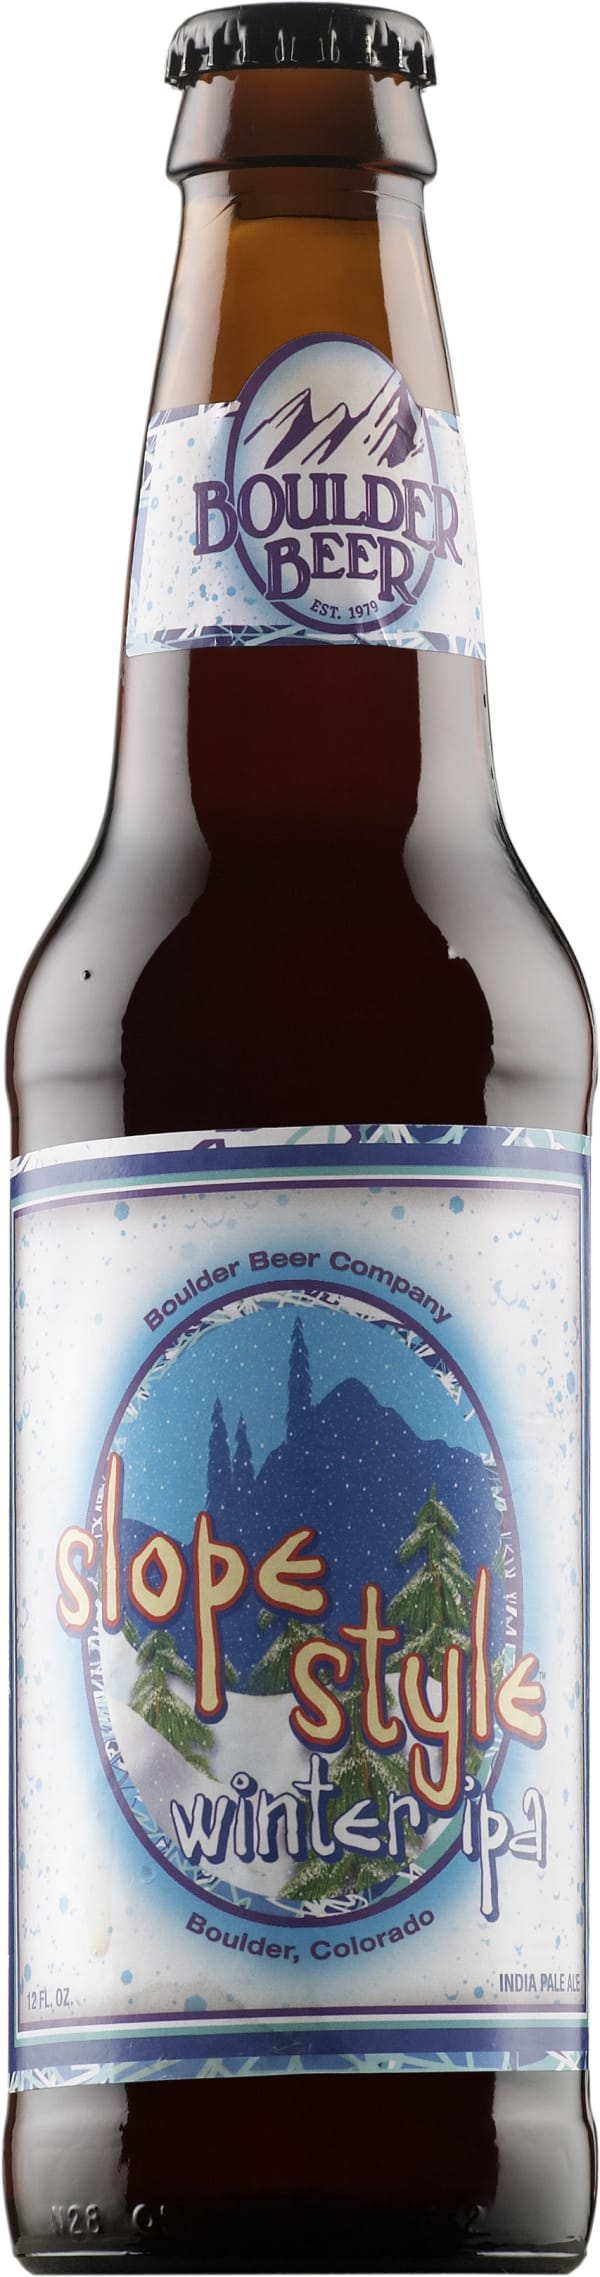 Boulder Beer Slope Style Winter IPA